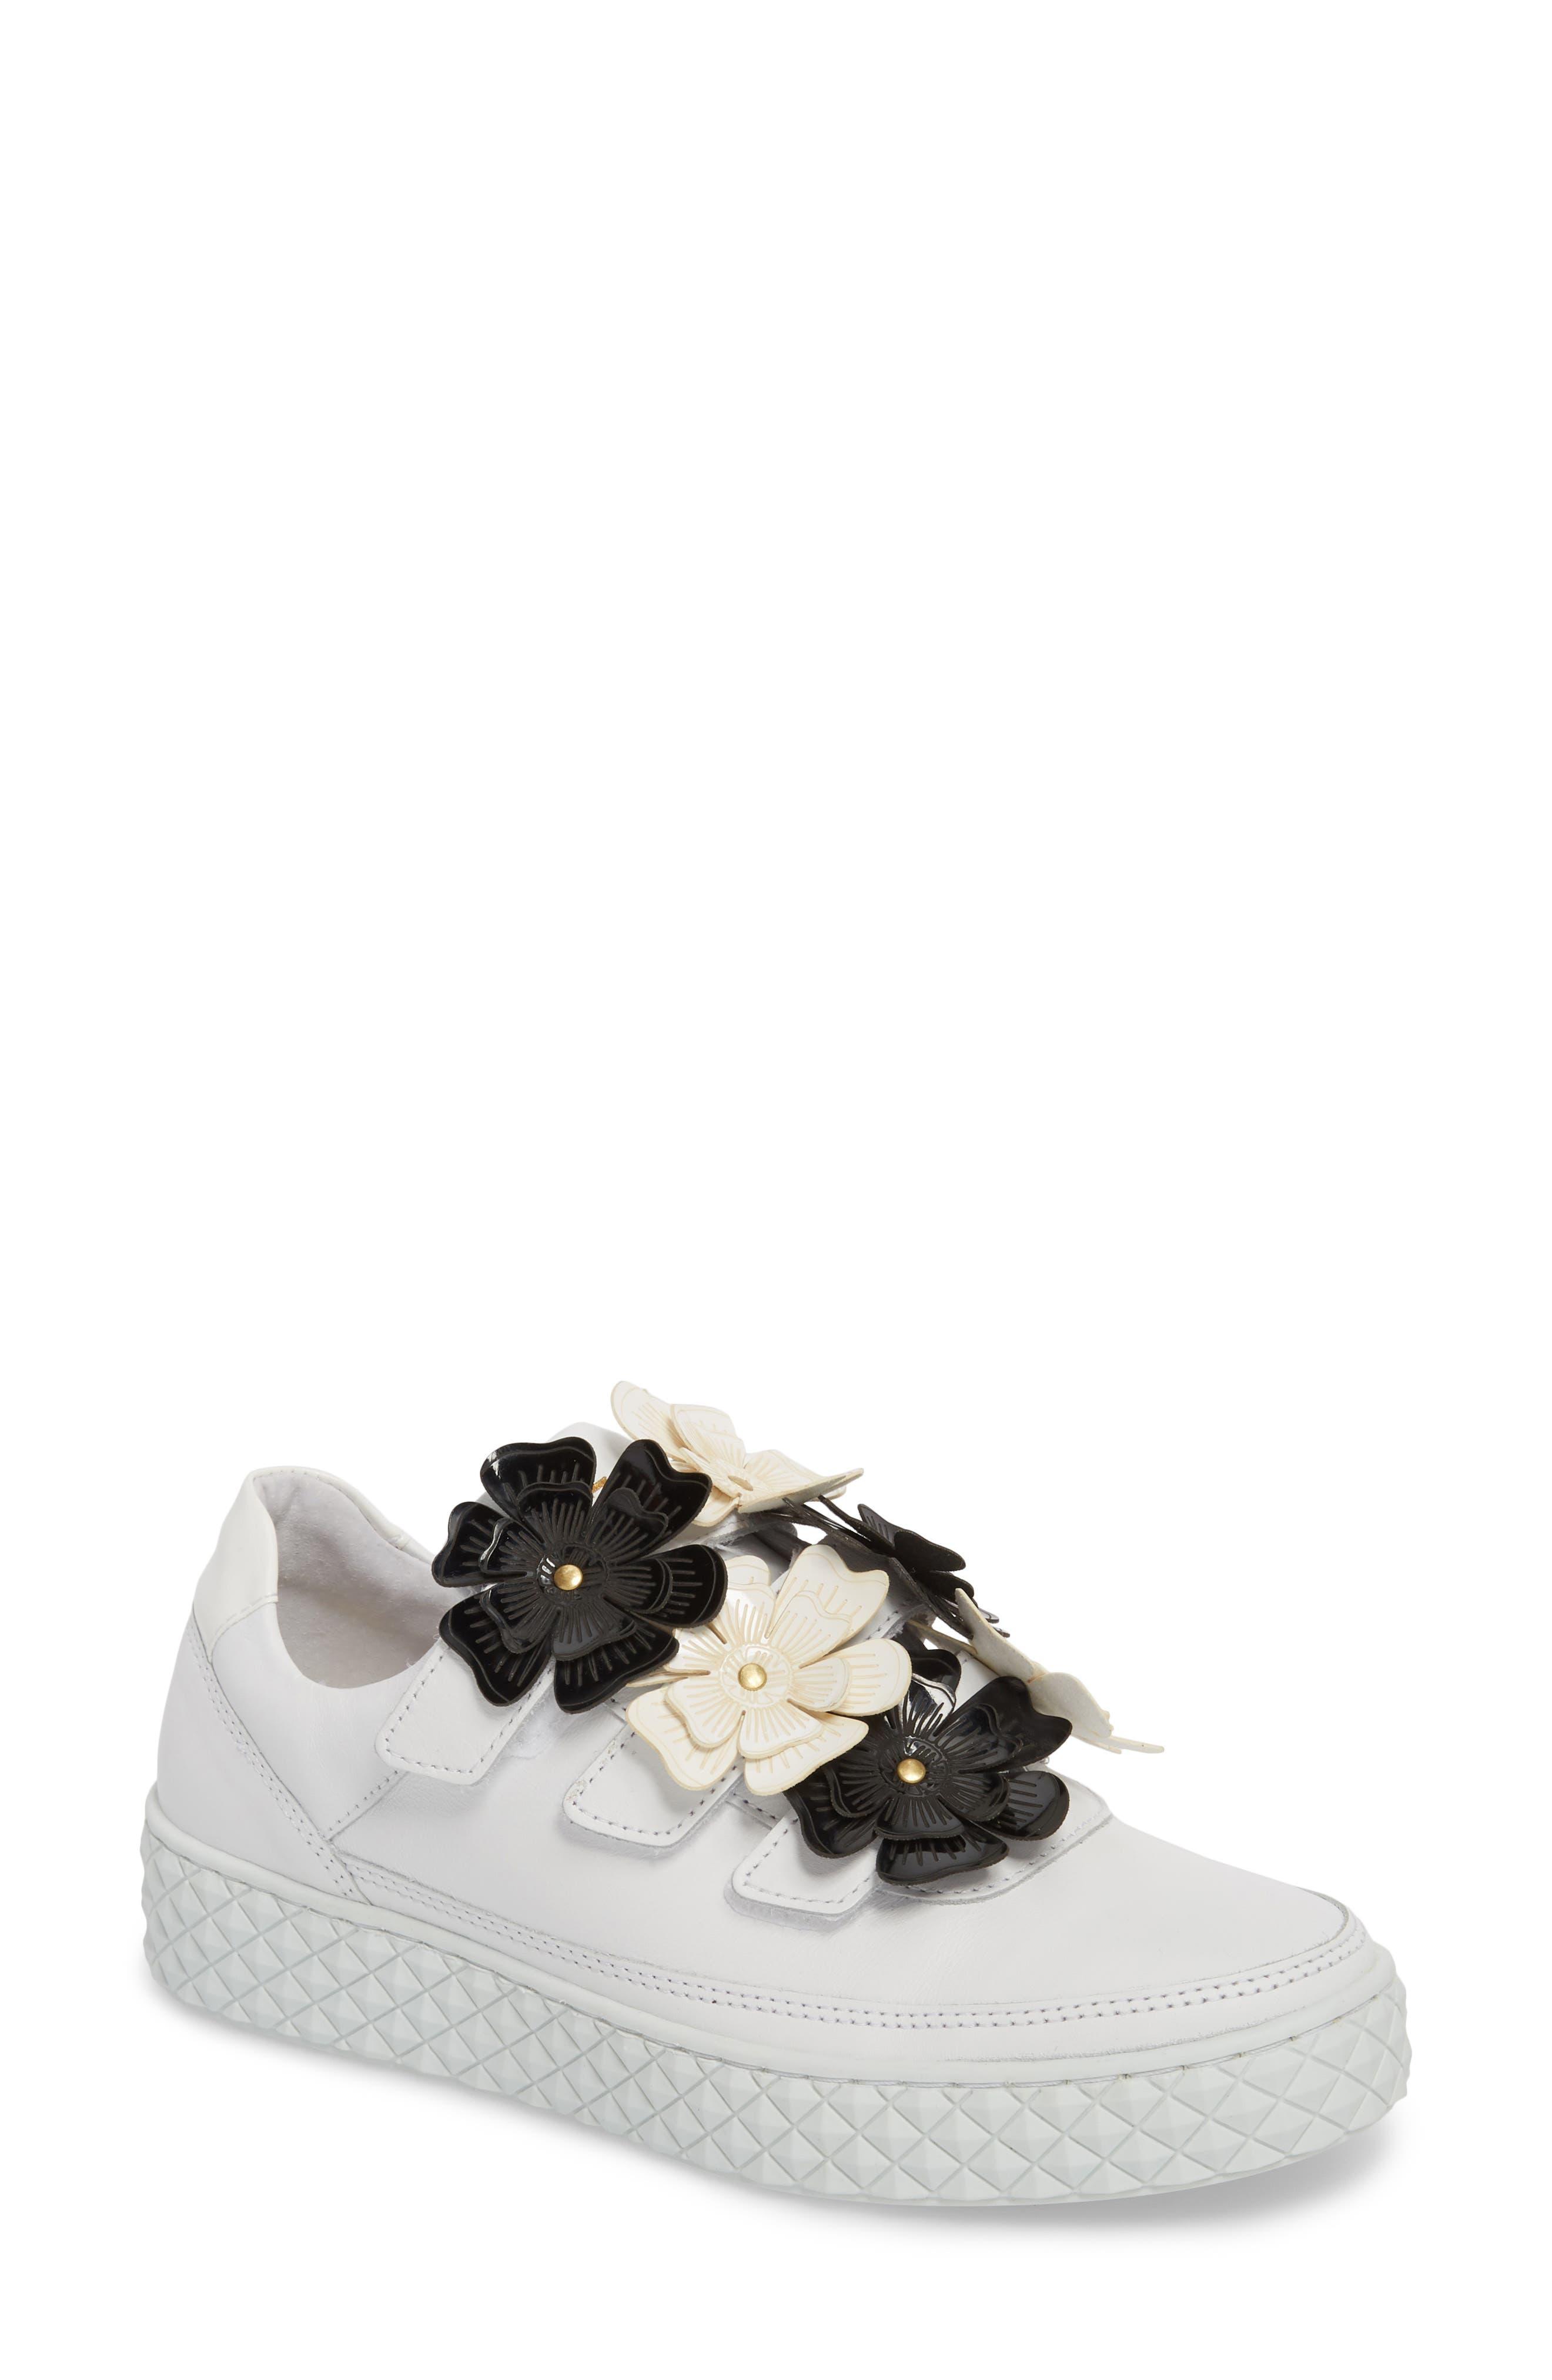 Hurou Embellished Sneaker,                             Main thumbnail 1, color,                             Optic White/ Black Leather